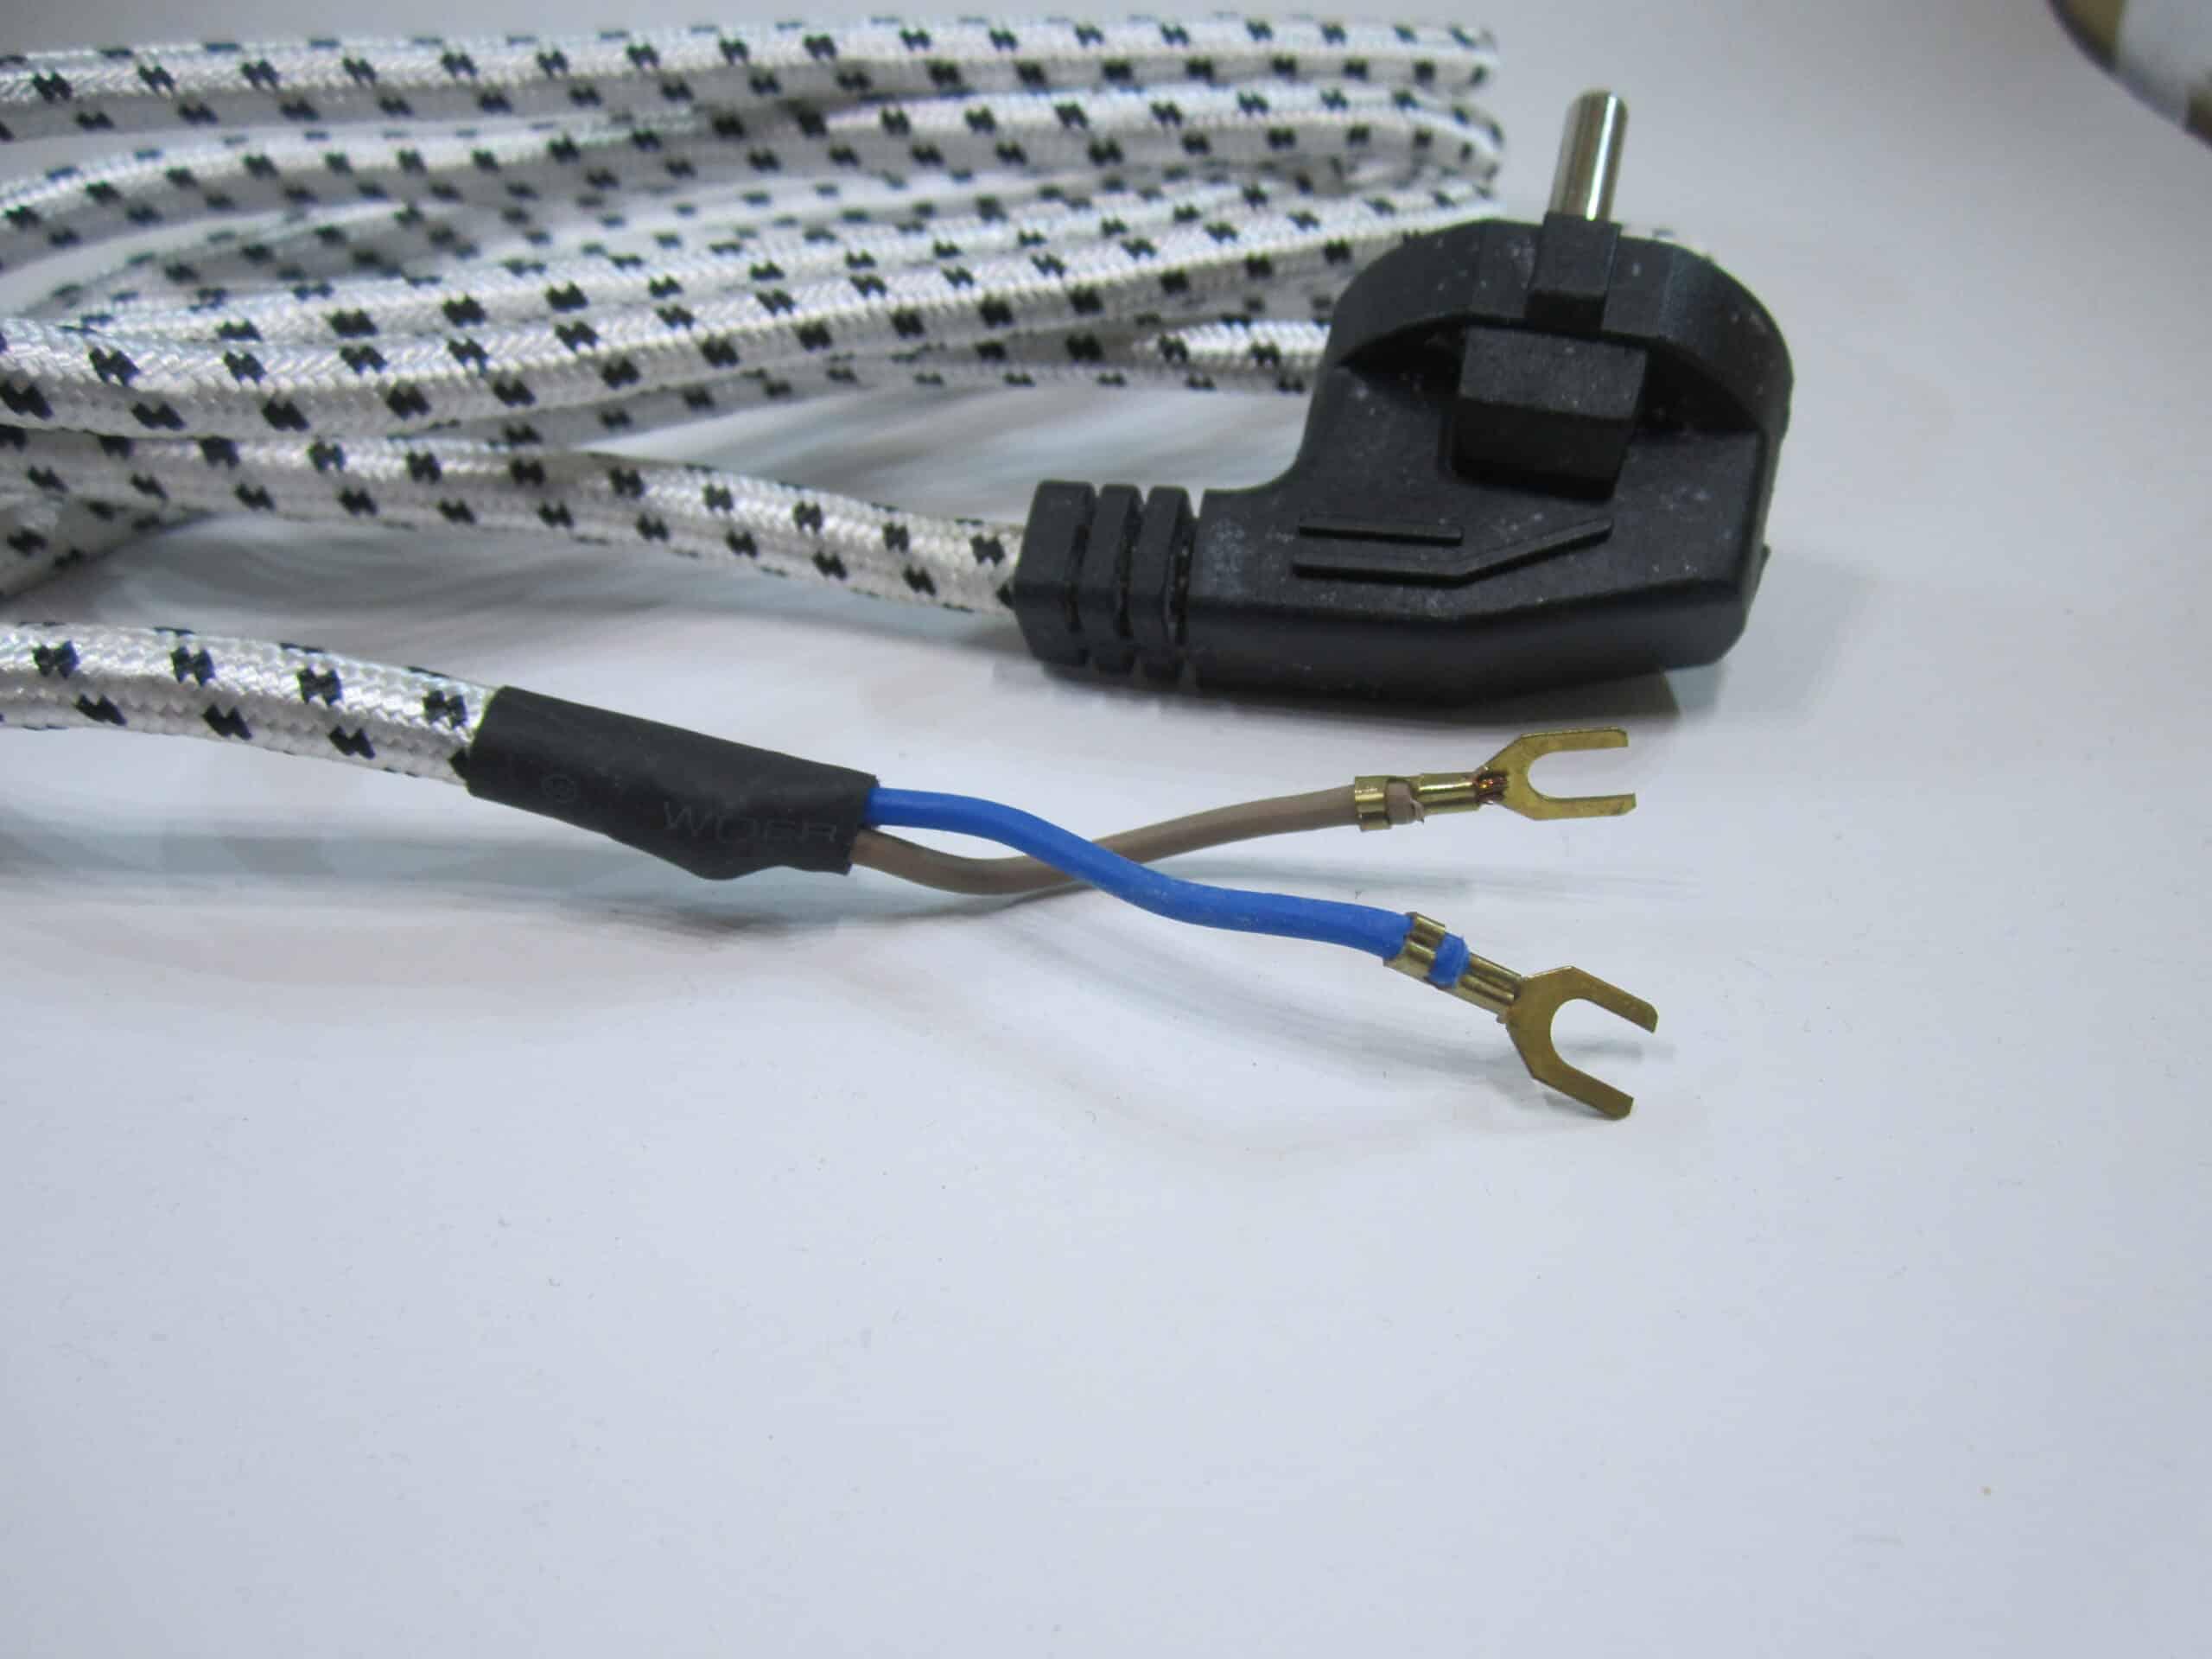 Pilih-Setrika-dengan-Panjang-Kabel-Sekitar-17-2-Meter